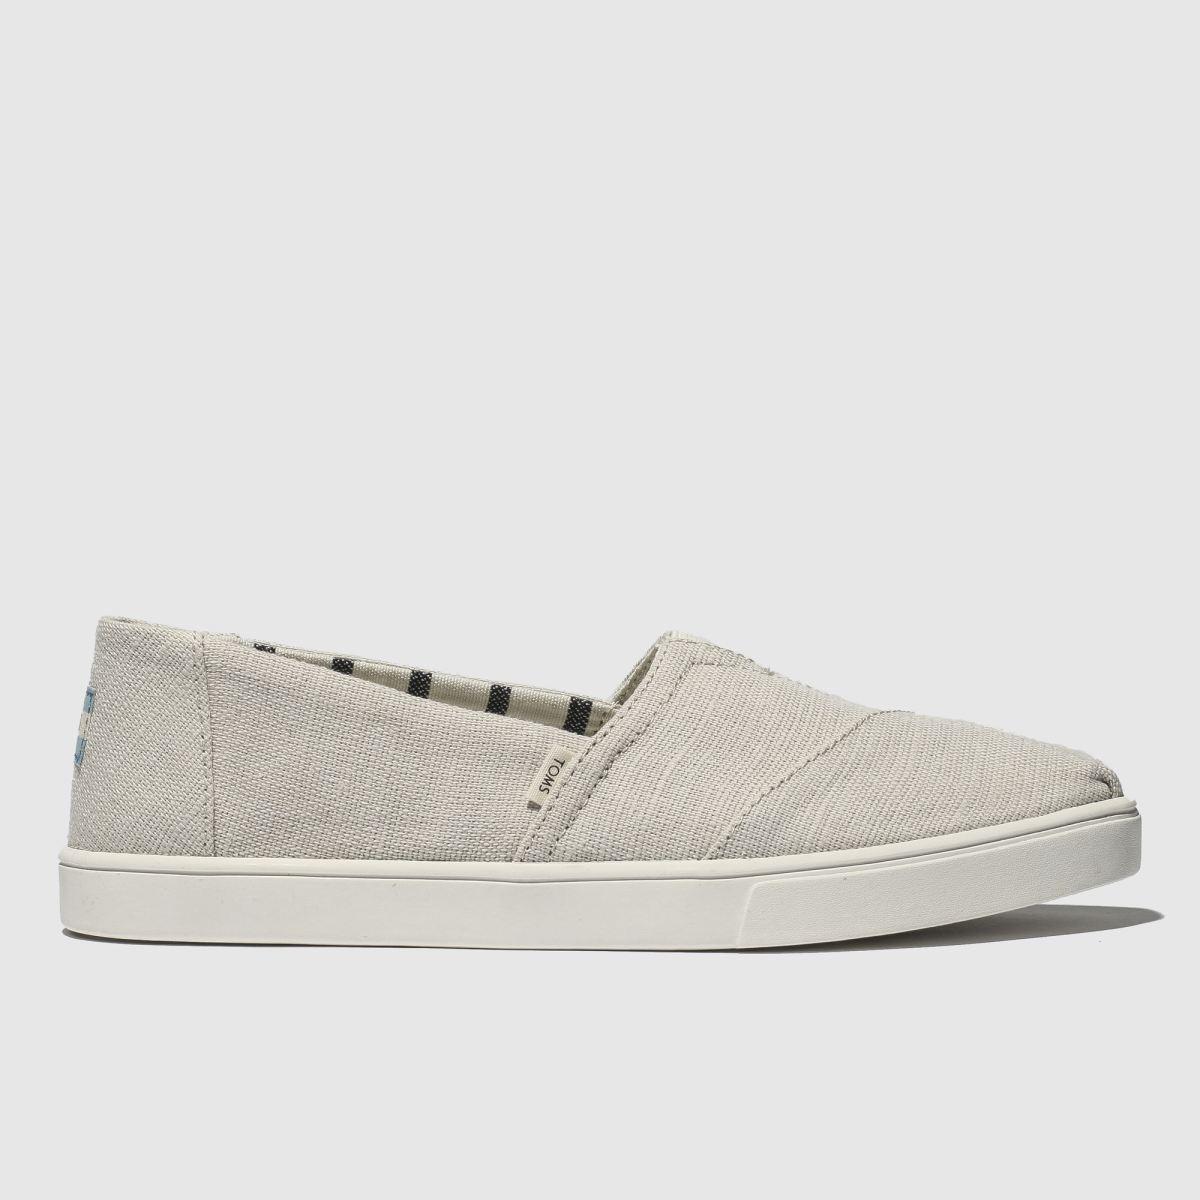 Toms Stone Alpargata Cupsole Flat Shoes